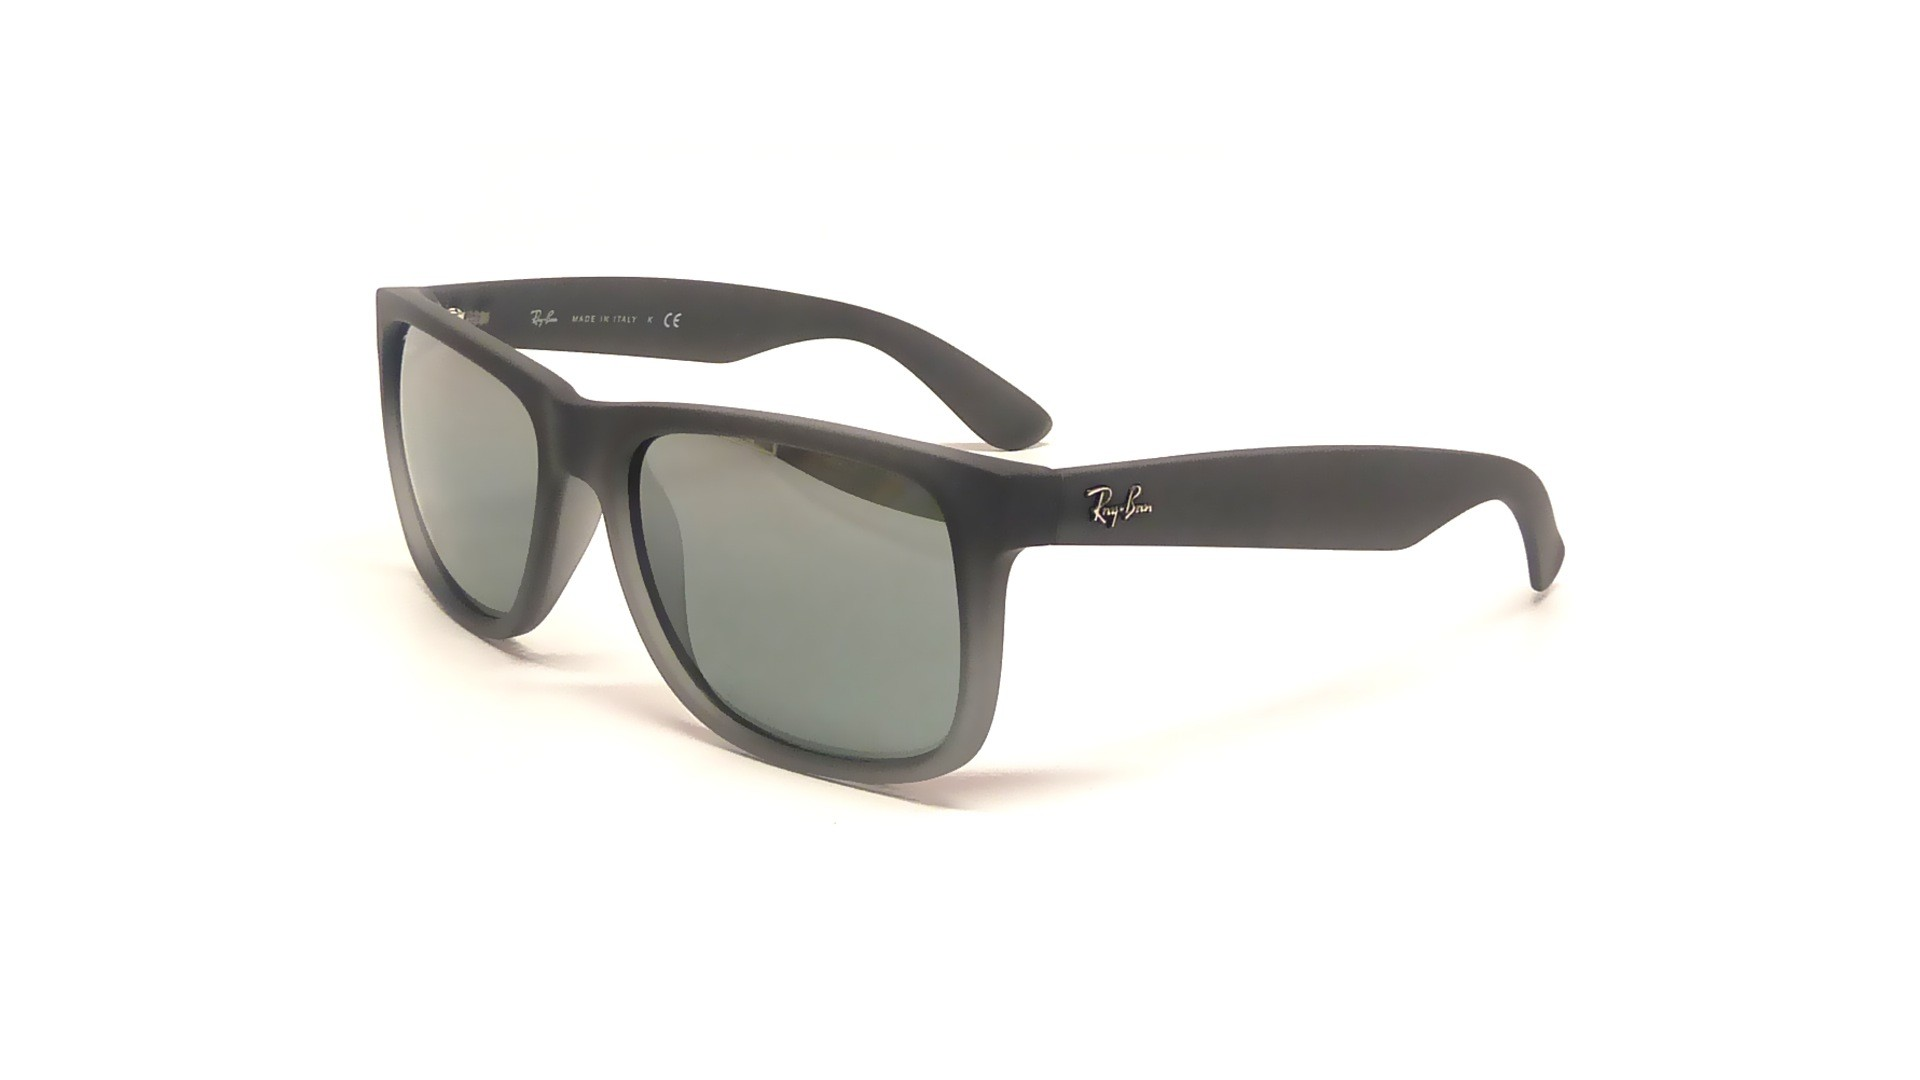 5682ed3f63a netherlands sunglasses ray ban justin grey rb4165 852 88 51 16 medium mirror  e762e 7d34b